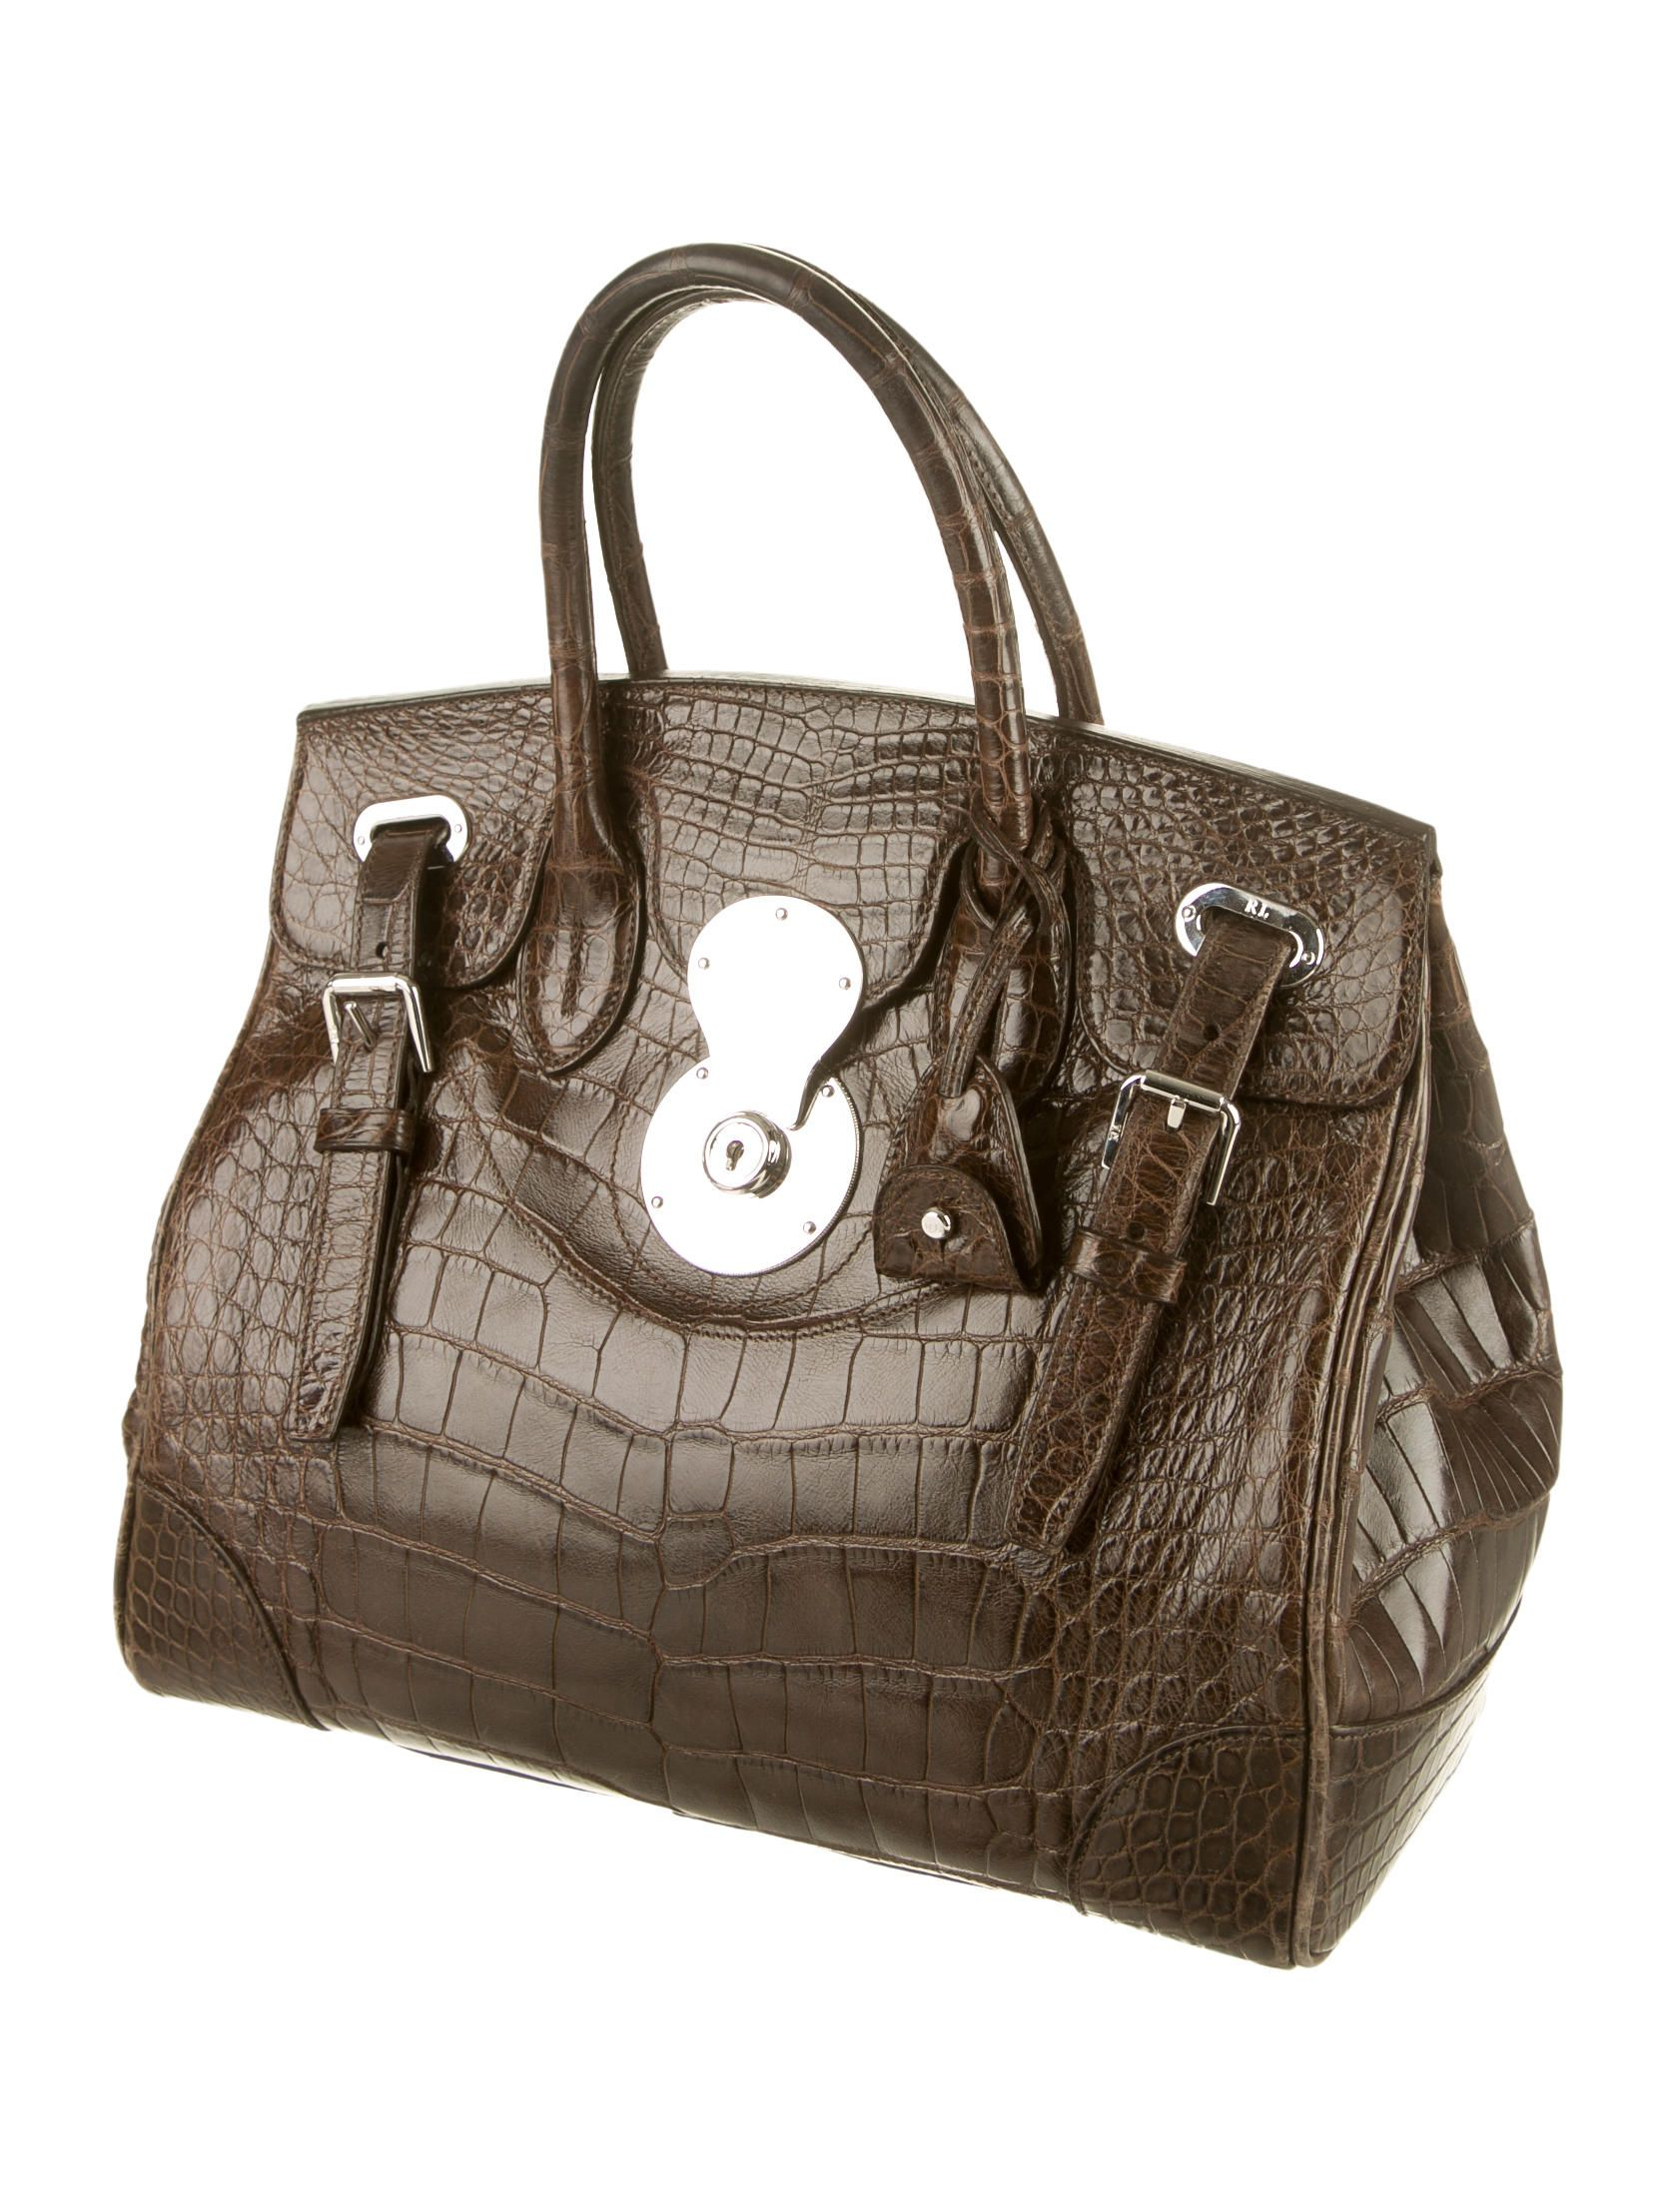 4dfab82e989e ... coupon ralph lauren alligator ricky bag handbags wyg20192 the realreal  a4389 78d41